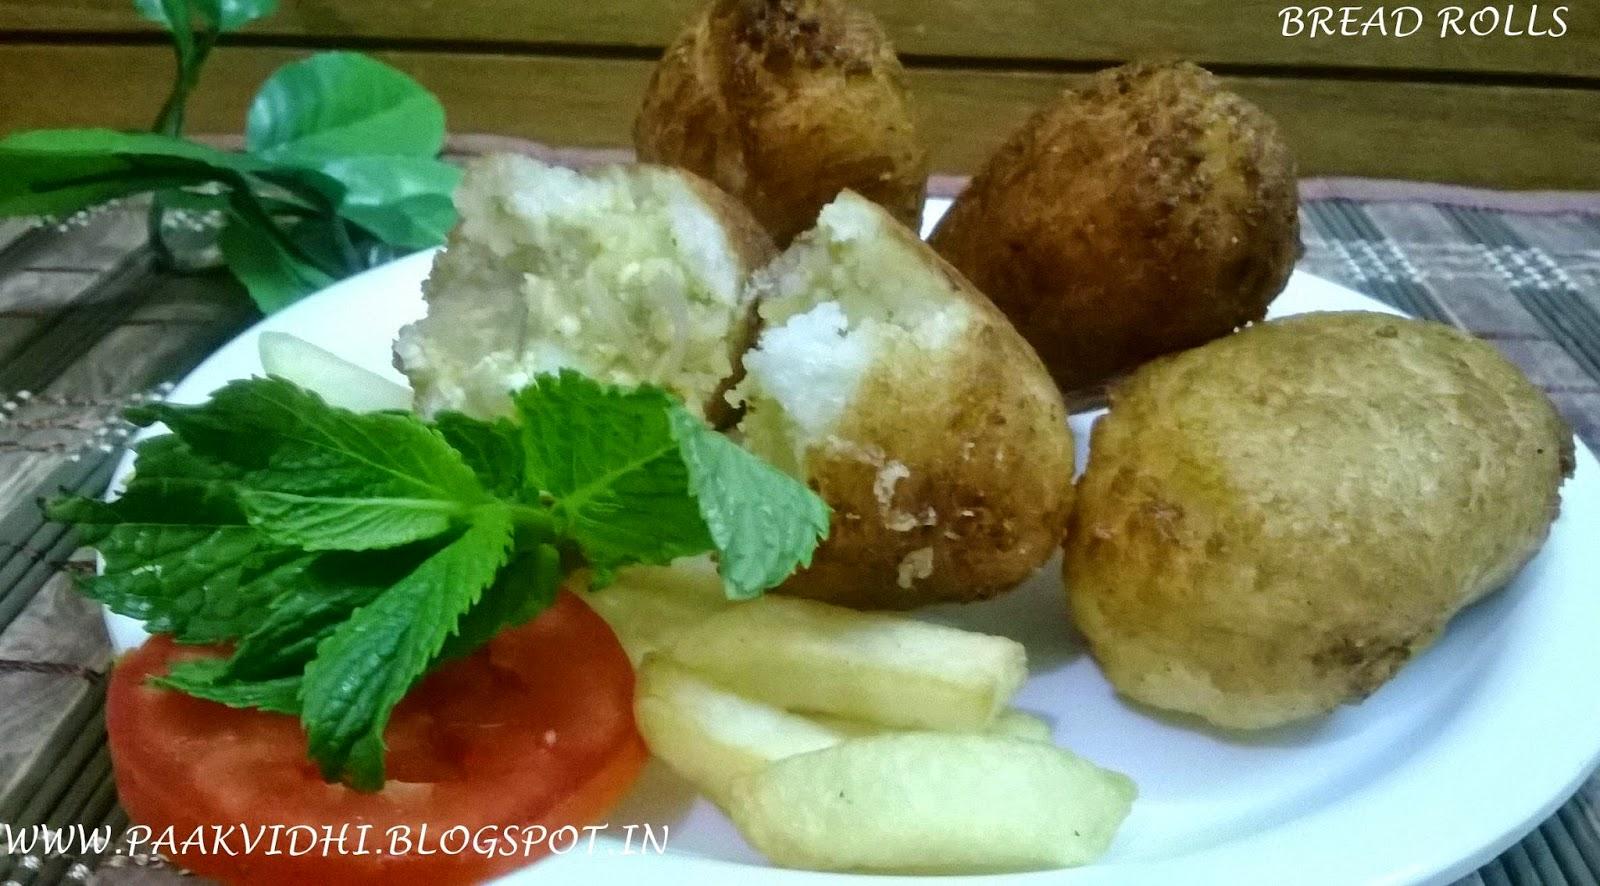 http://paakvidhi.blogspot.in/2014/09/bread-rolls.html